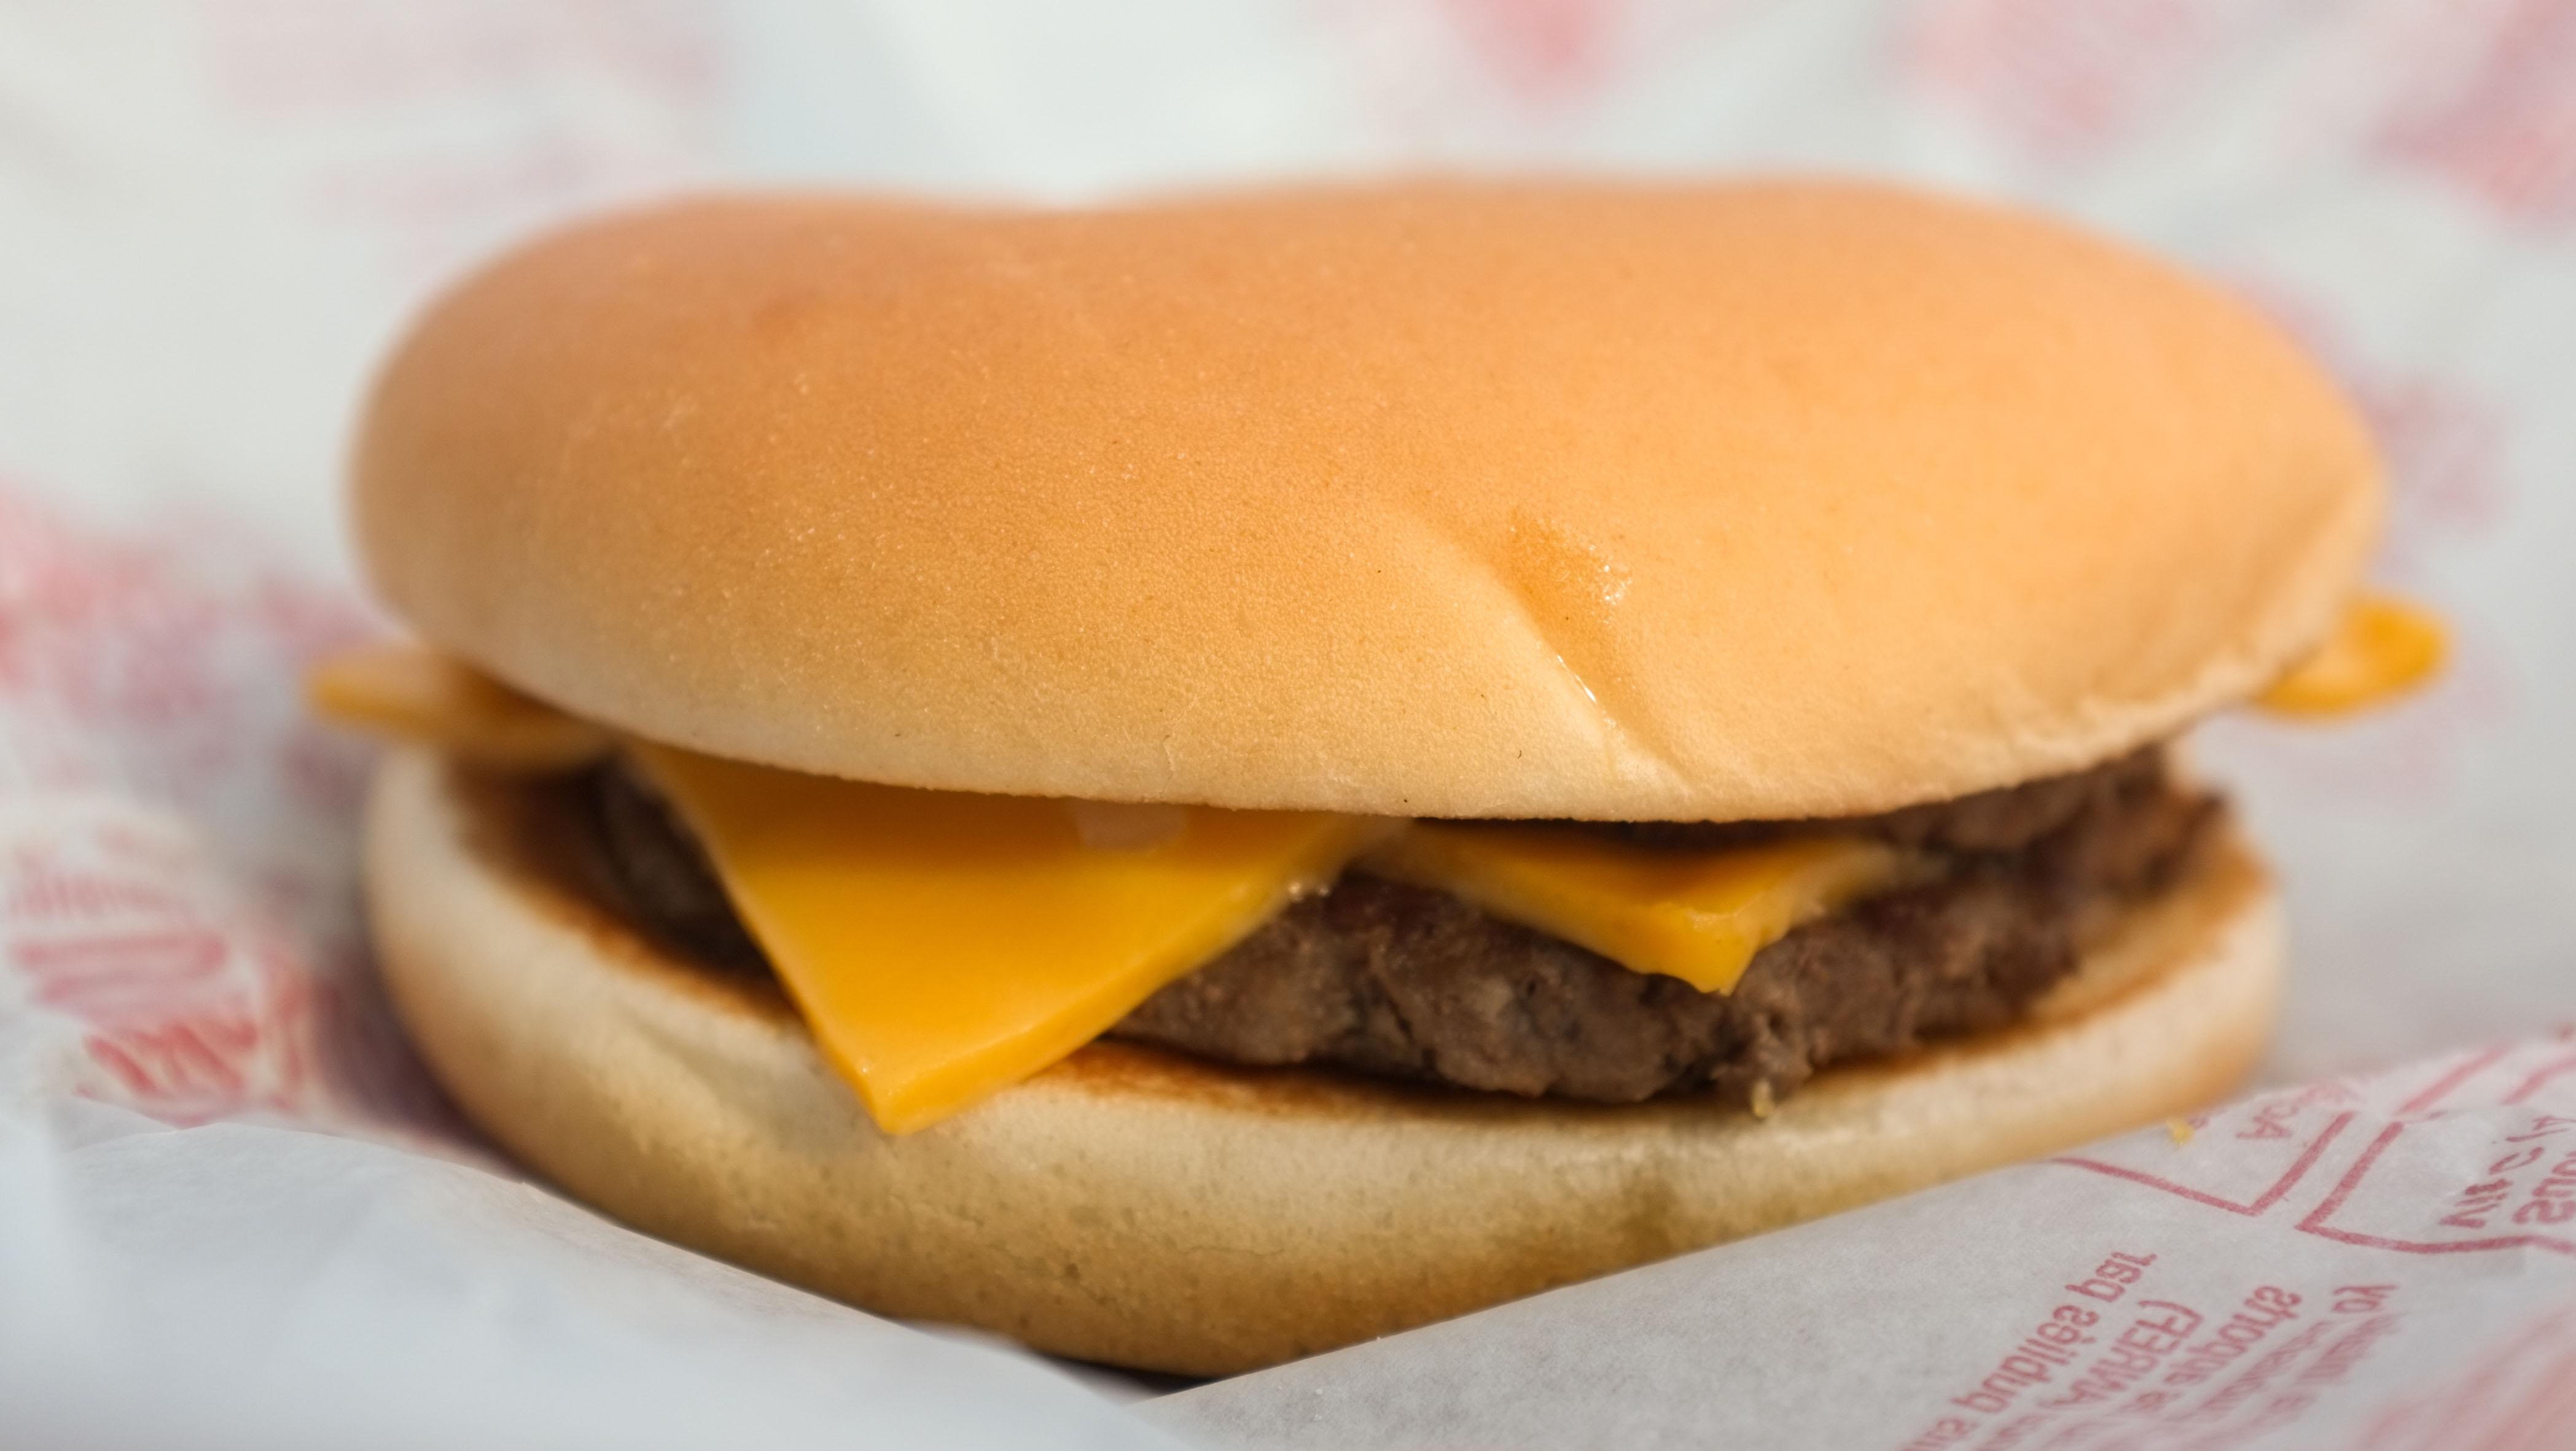 A cheeseburger.